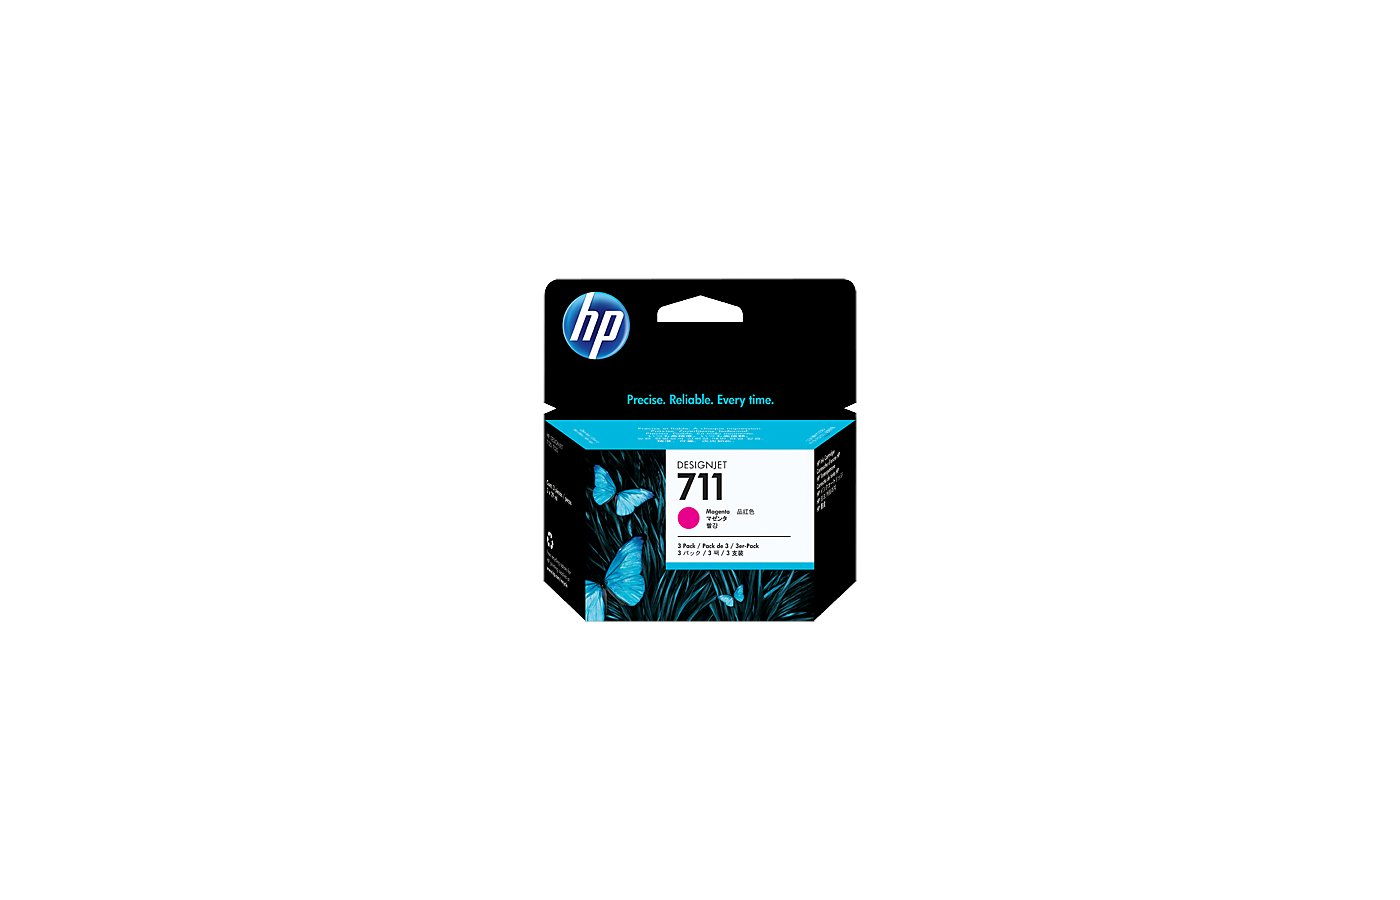 Картридж струйный HP 711 CZ135A пурпурный x3уп. для HP DJ T120/T520